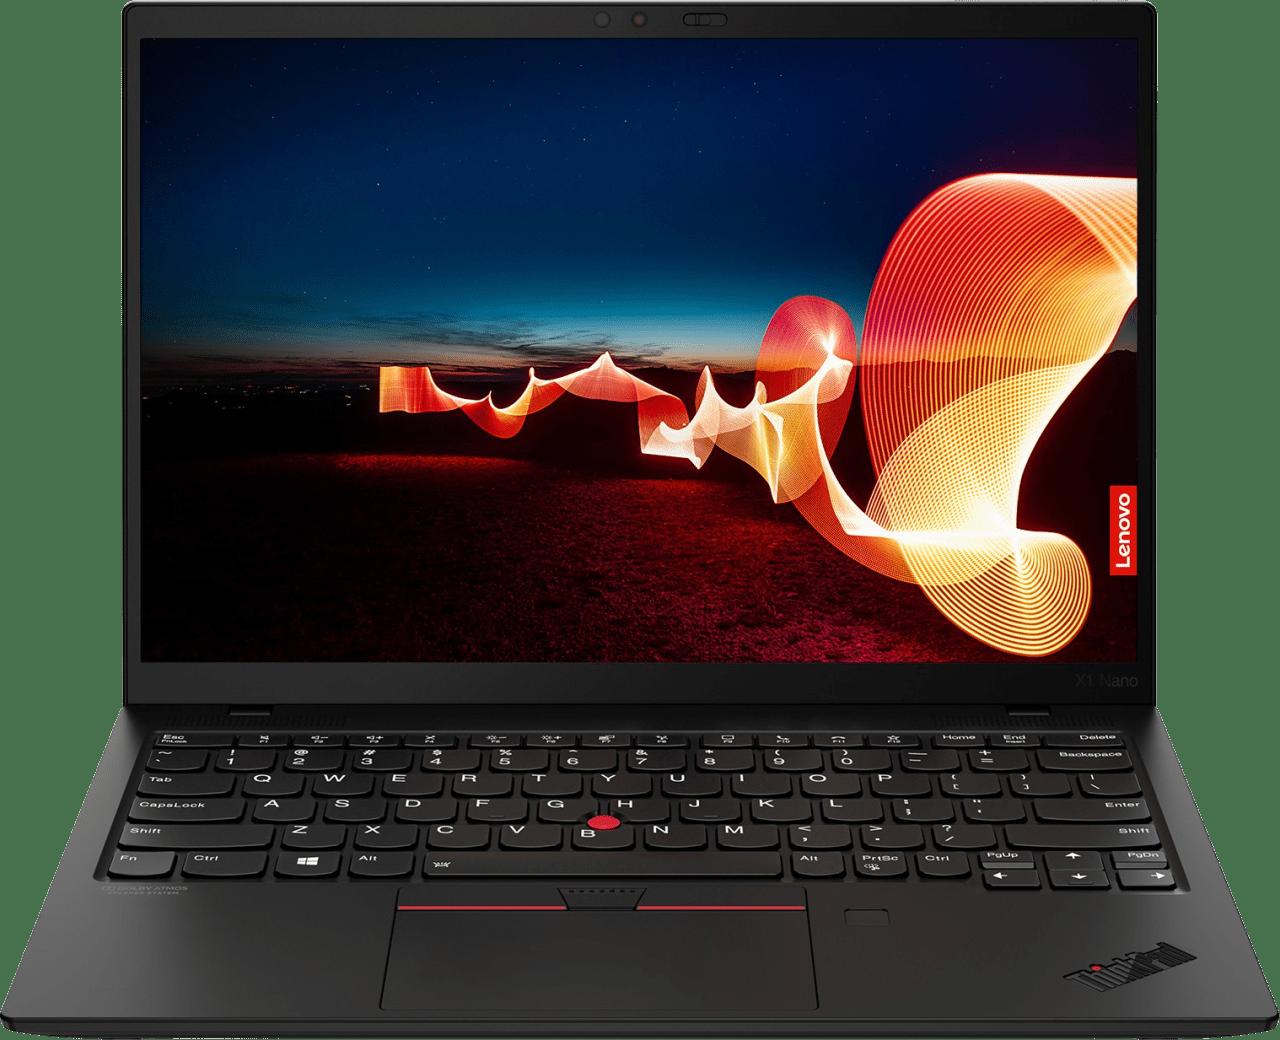 Black Lenovo ThinkPad X1 Nano G1 Laptop - Intel® Core™ i7-1160G7 - 16GB - 1TB SSD - Intel® Iris® Xe Graphics.1